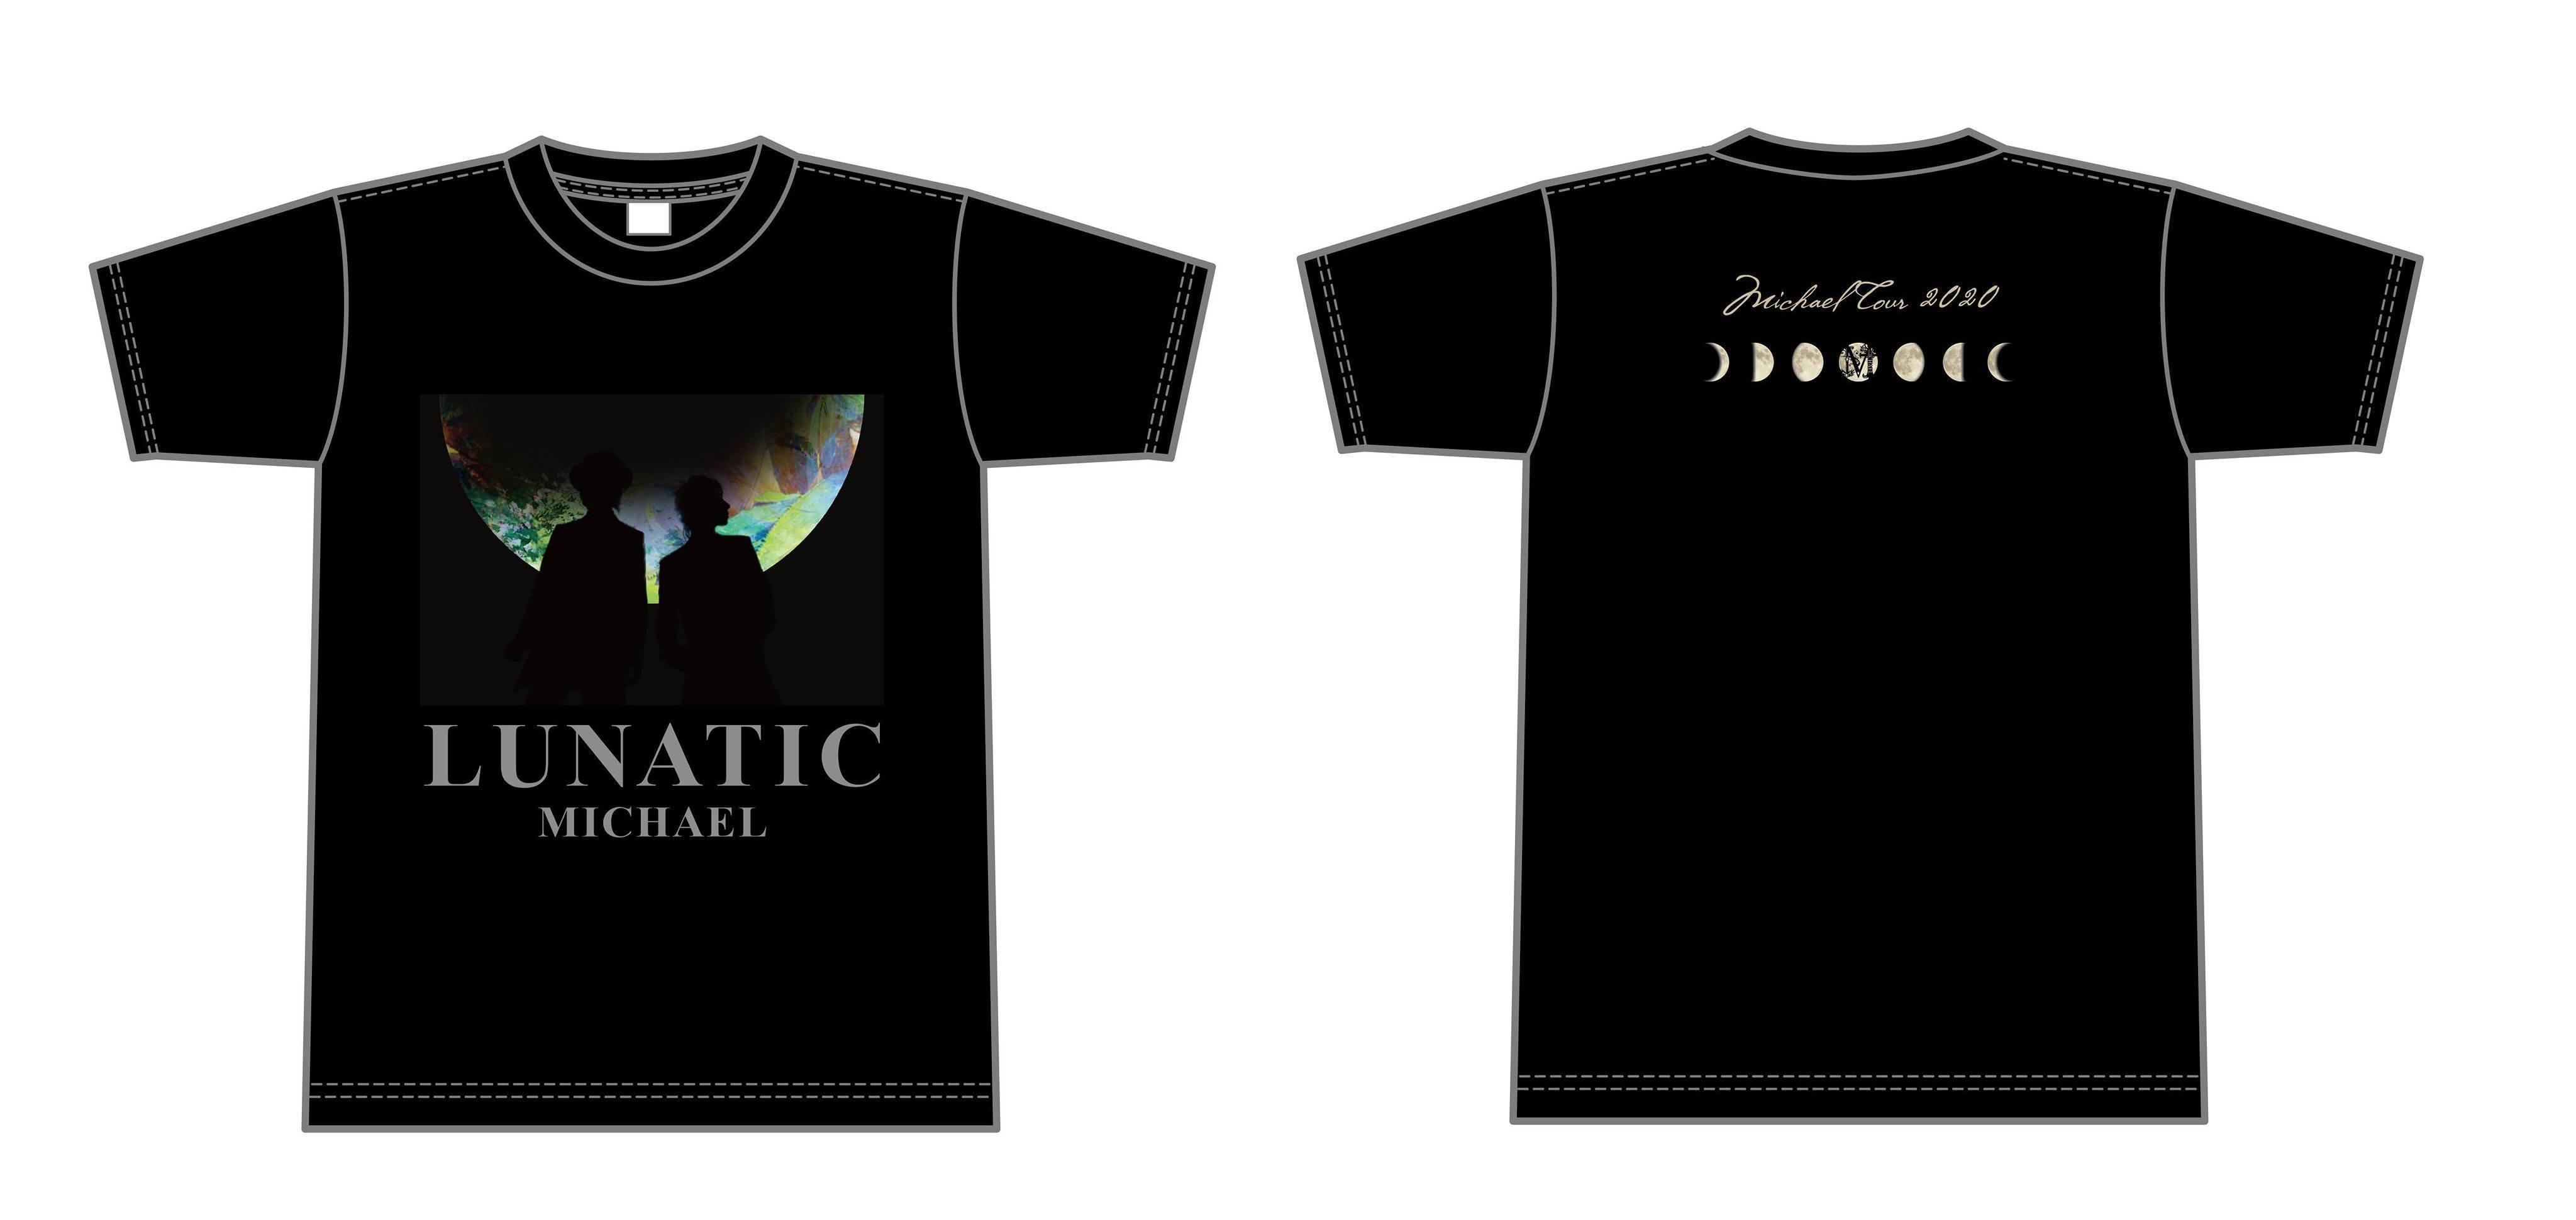 【MICHAEL TOUR 2020 Lunatic】ツアー Tシャツ